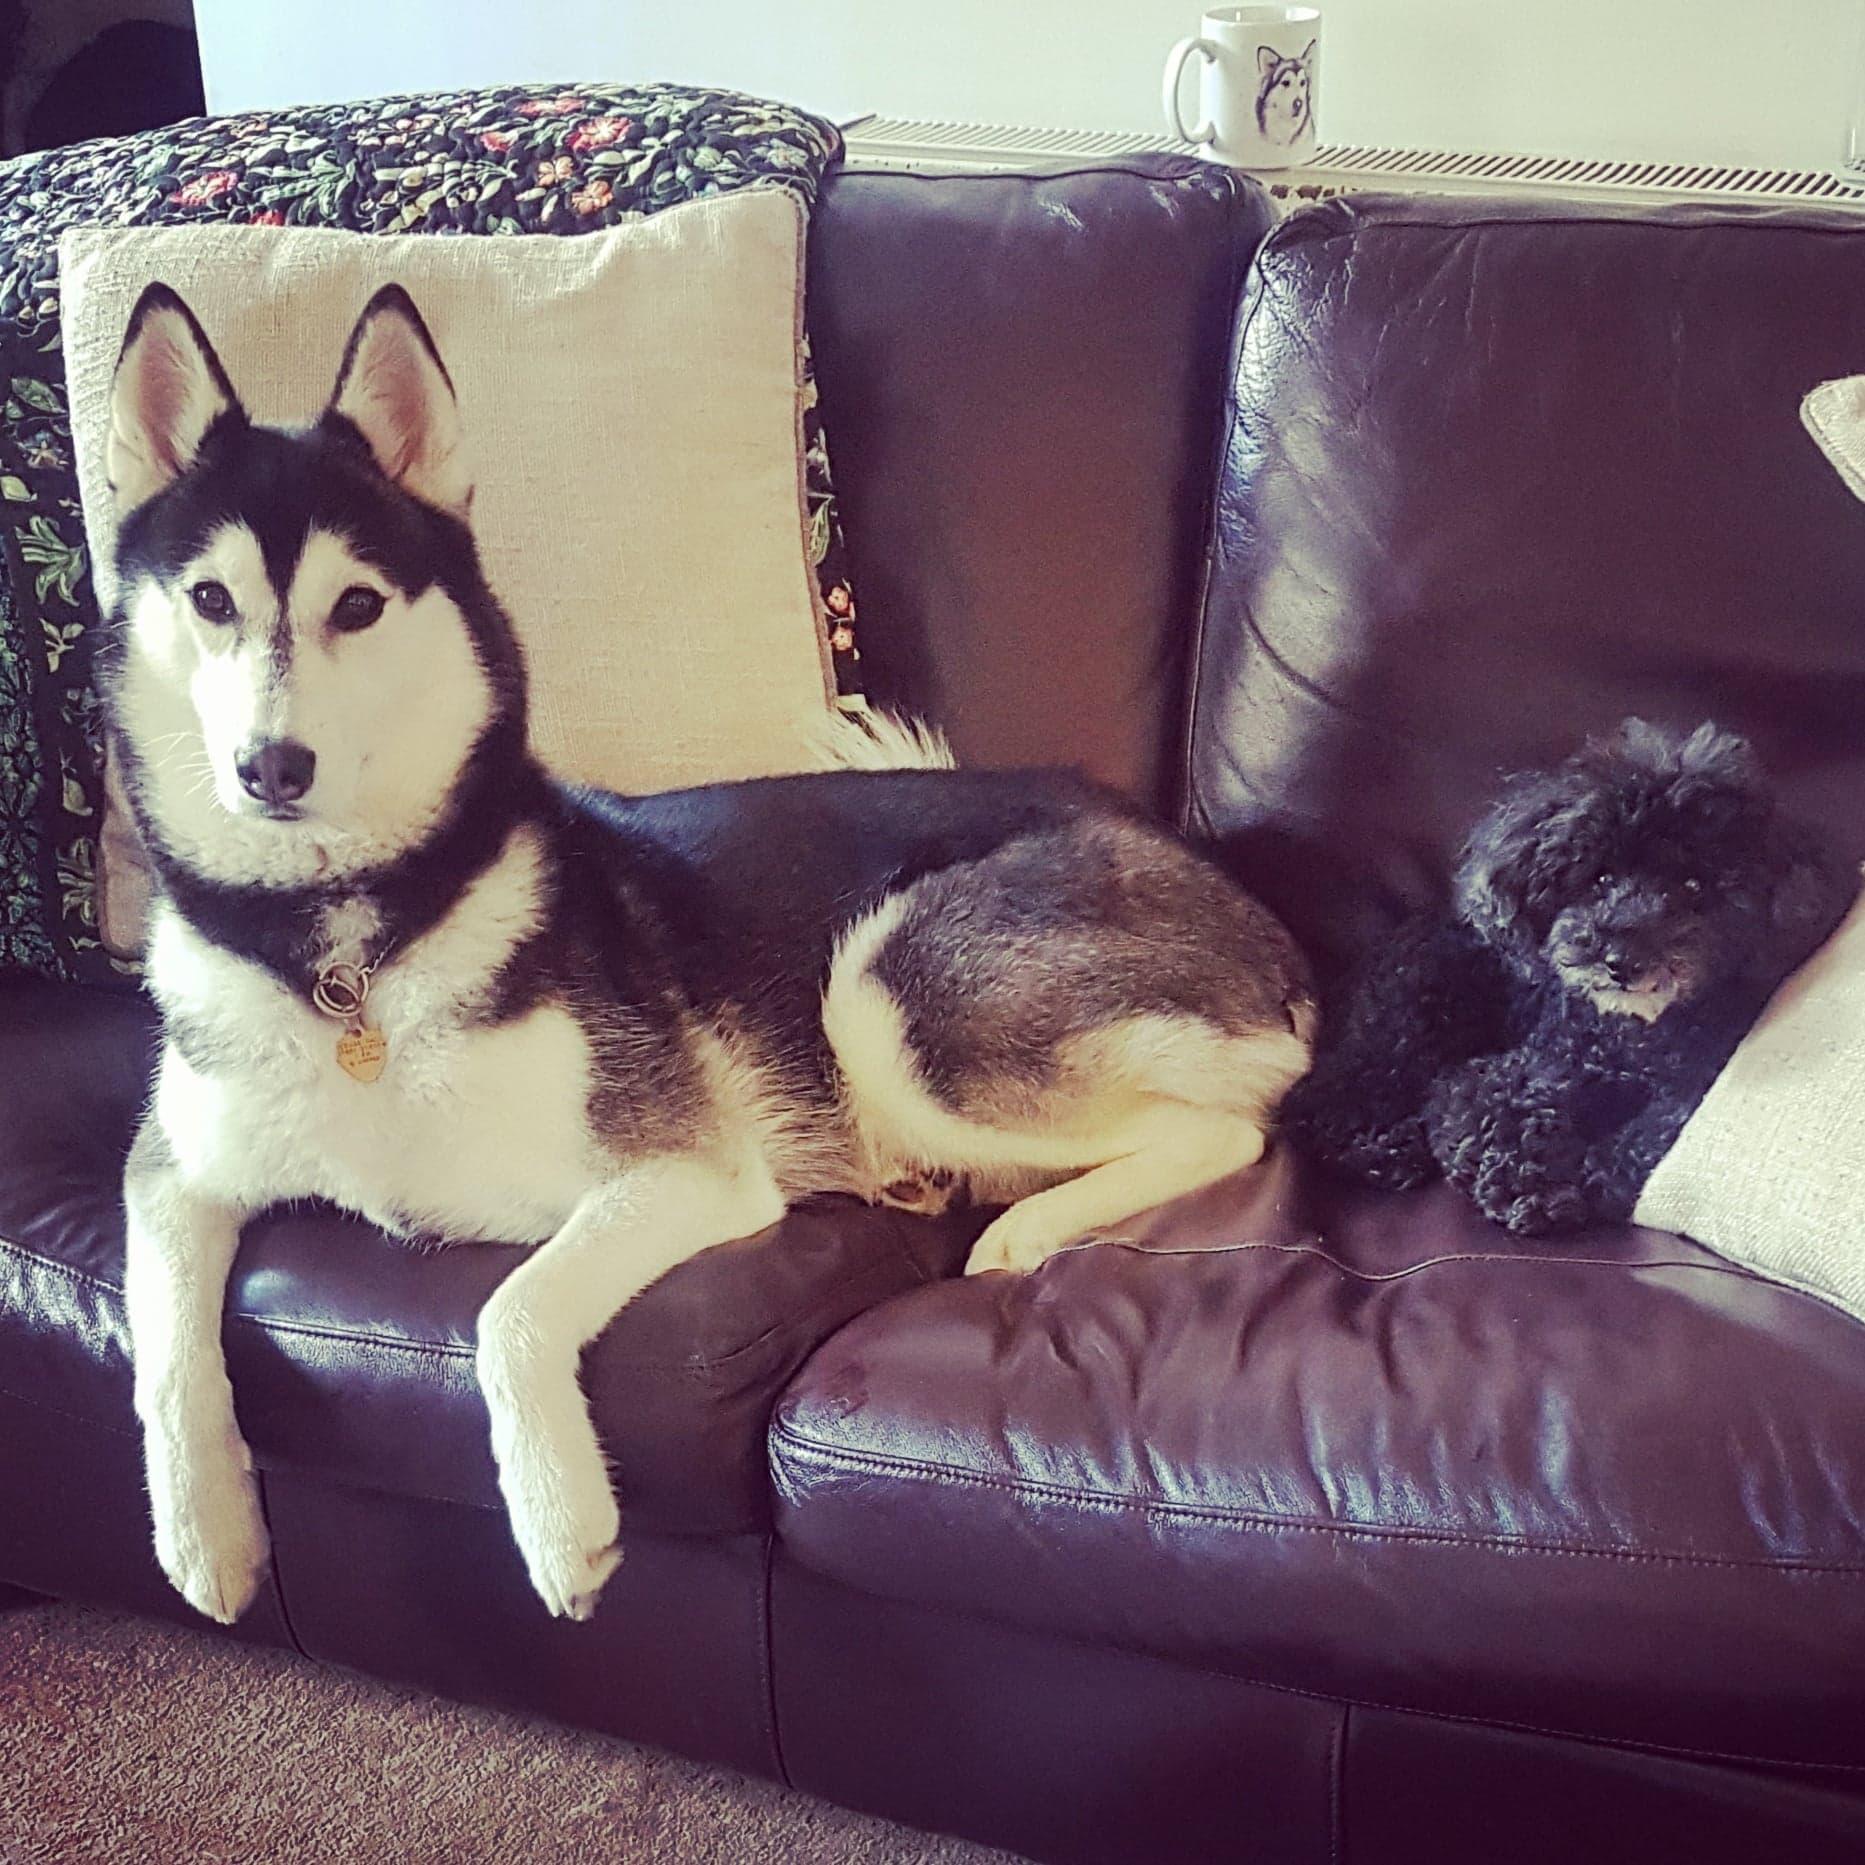 Viv and Jaxx